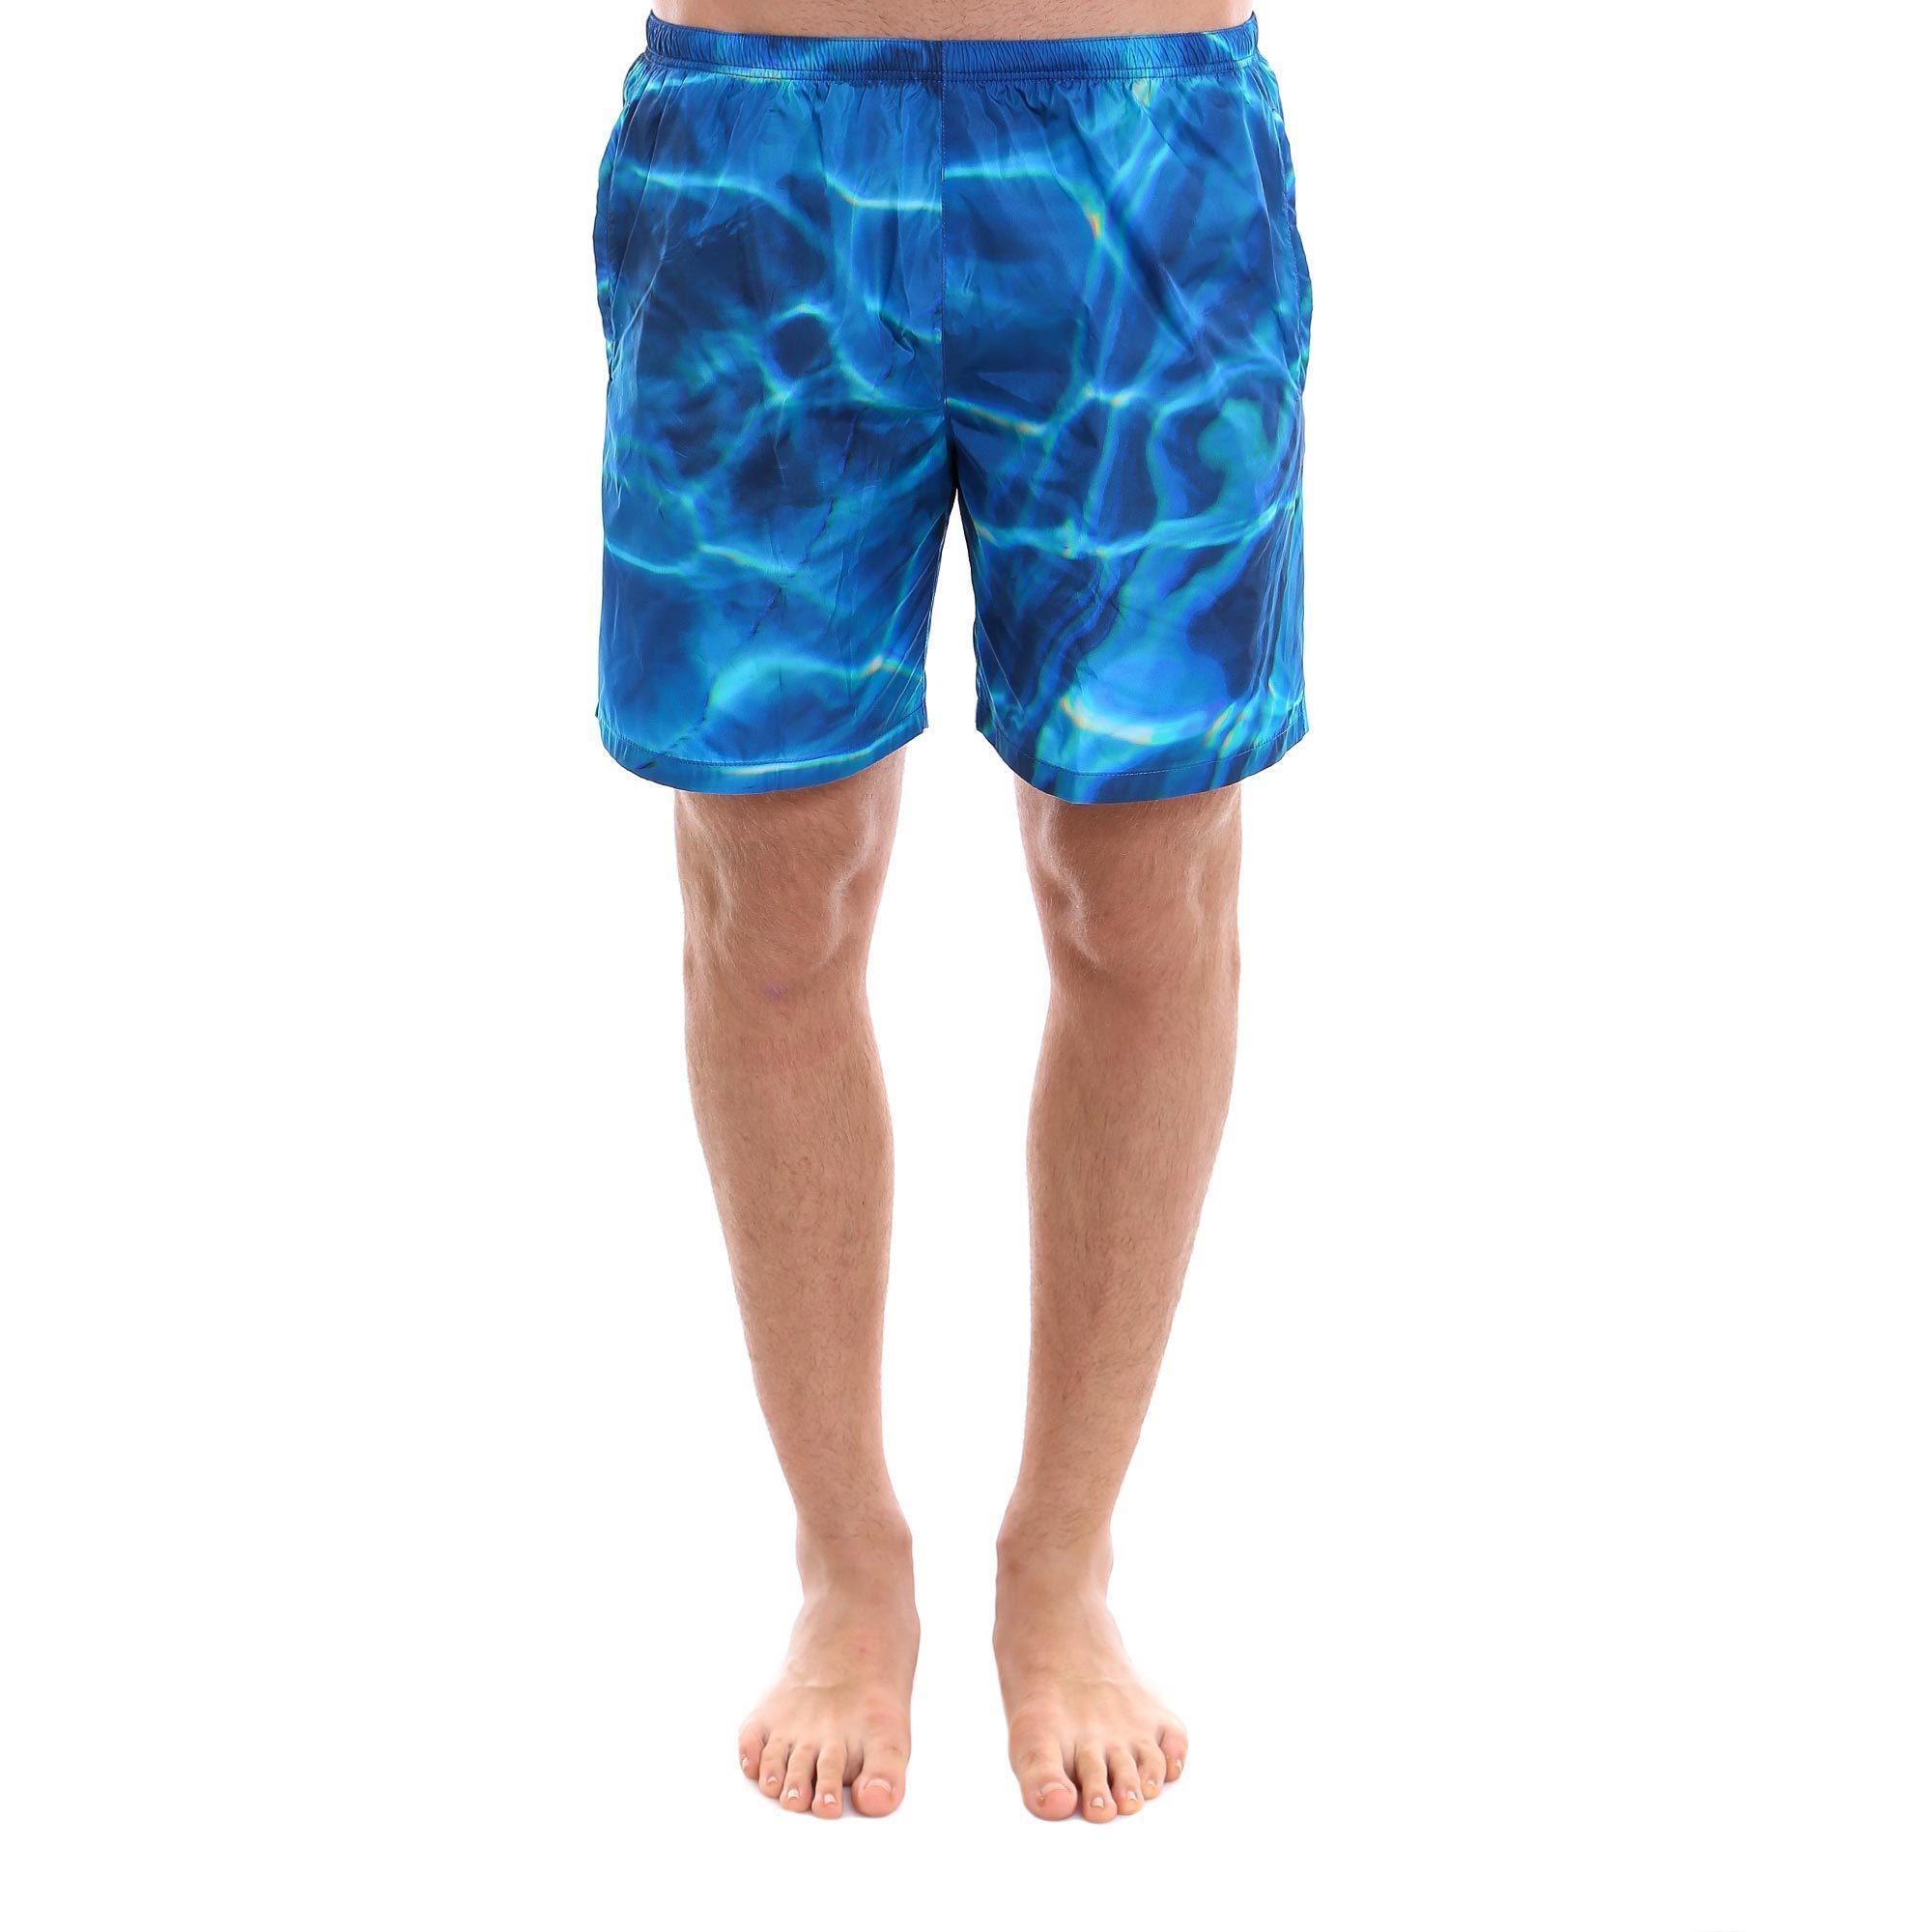 7b1e504c66284 Prada Linea Rossa Printed Swim Shorts In Bluette | ModeSens